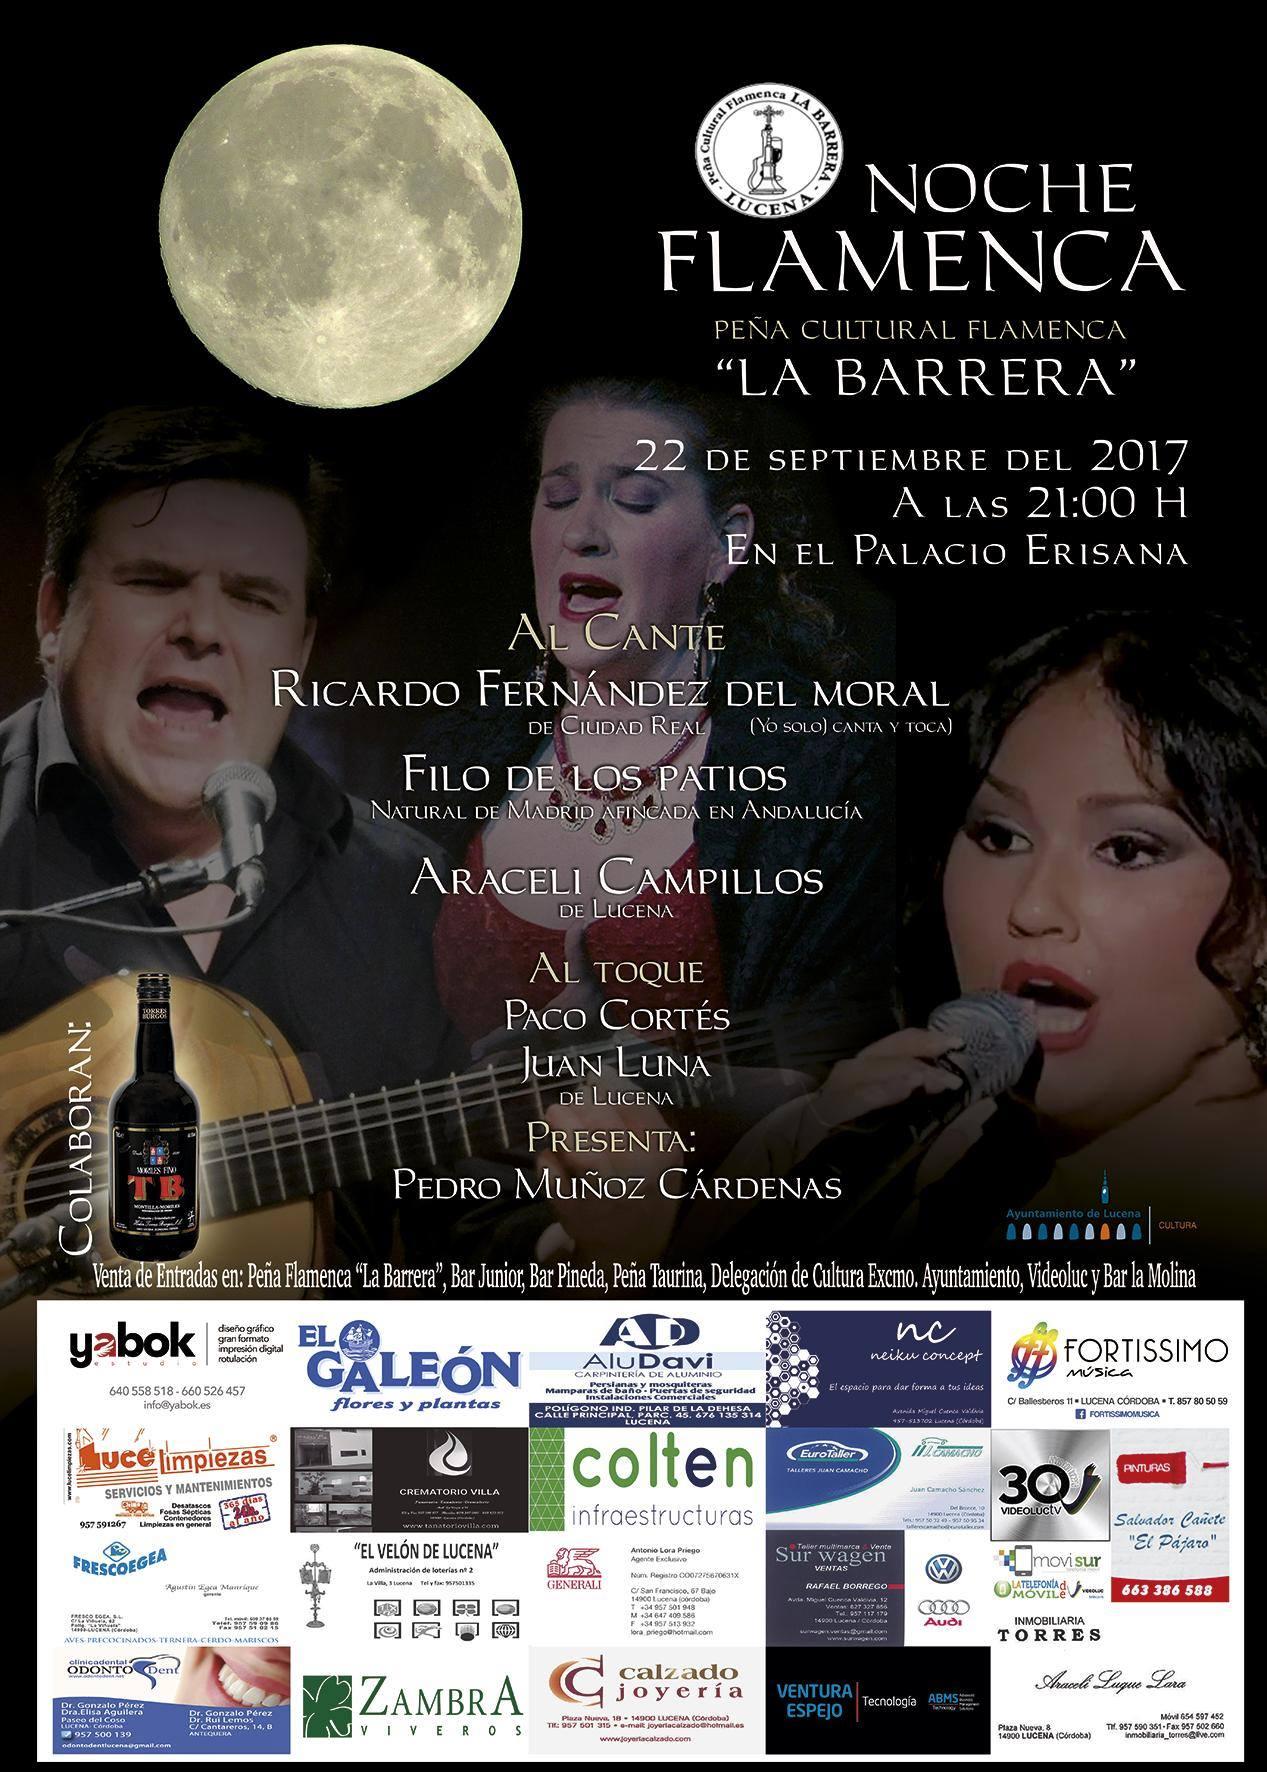 Noche Flamenca @ Palacio Erisana